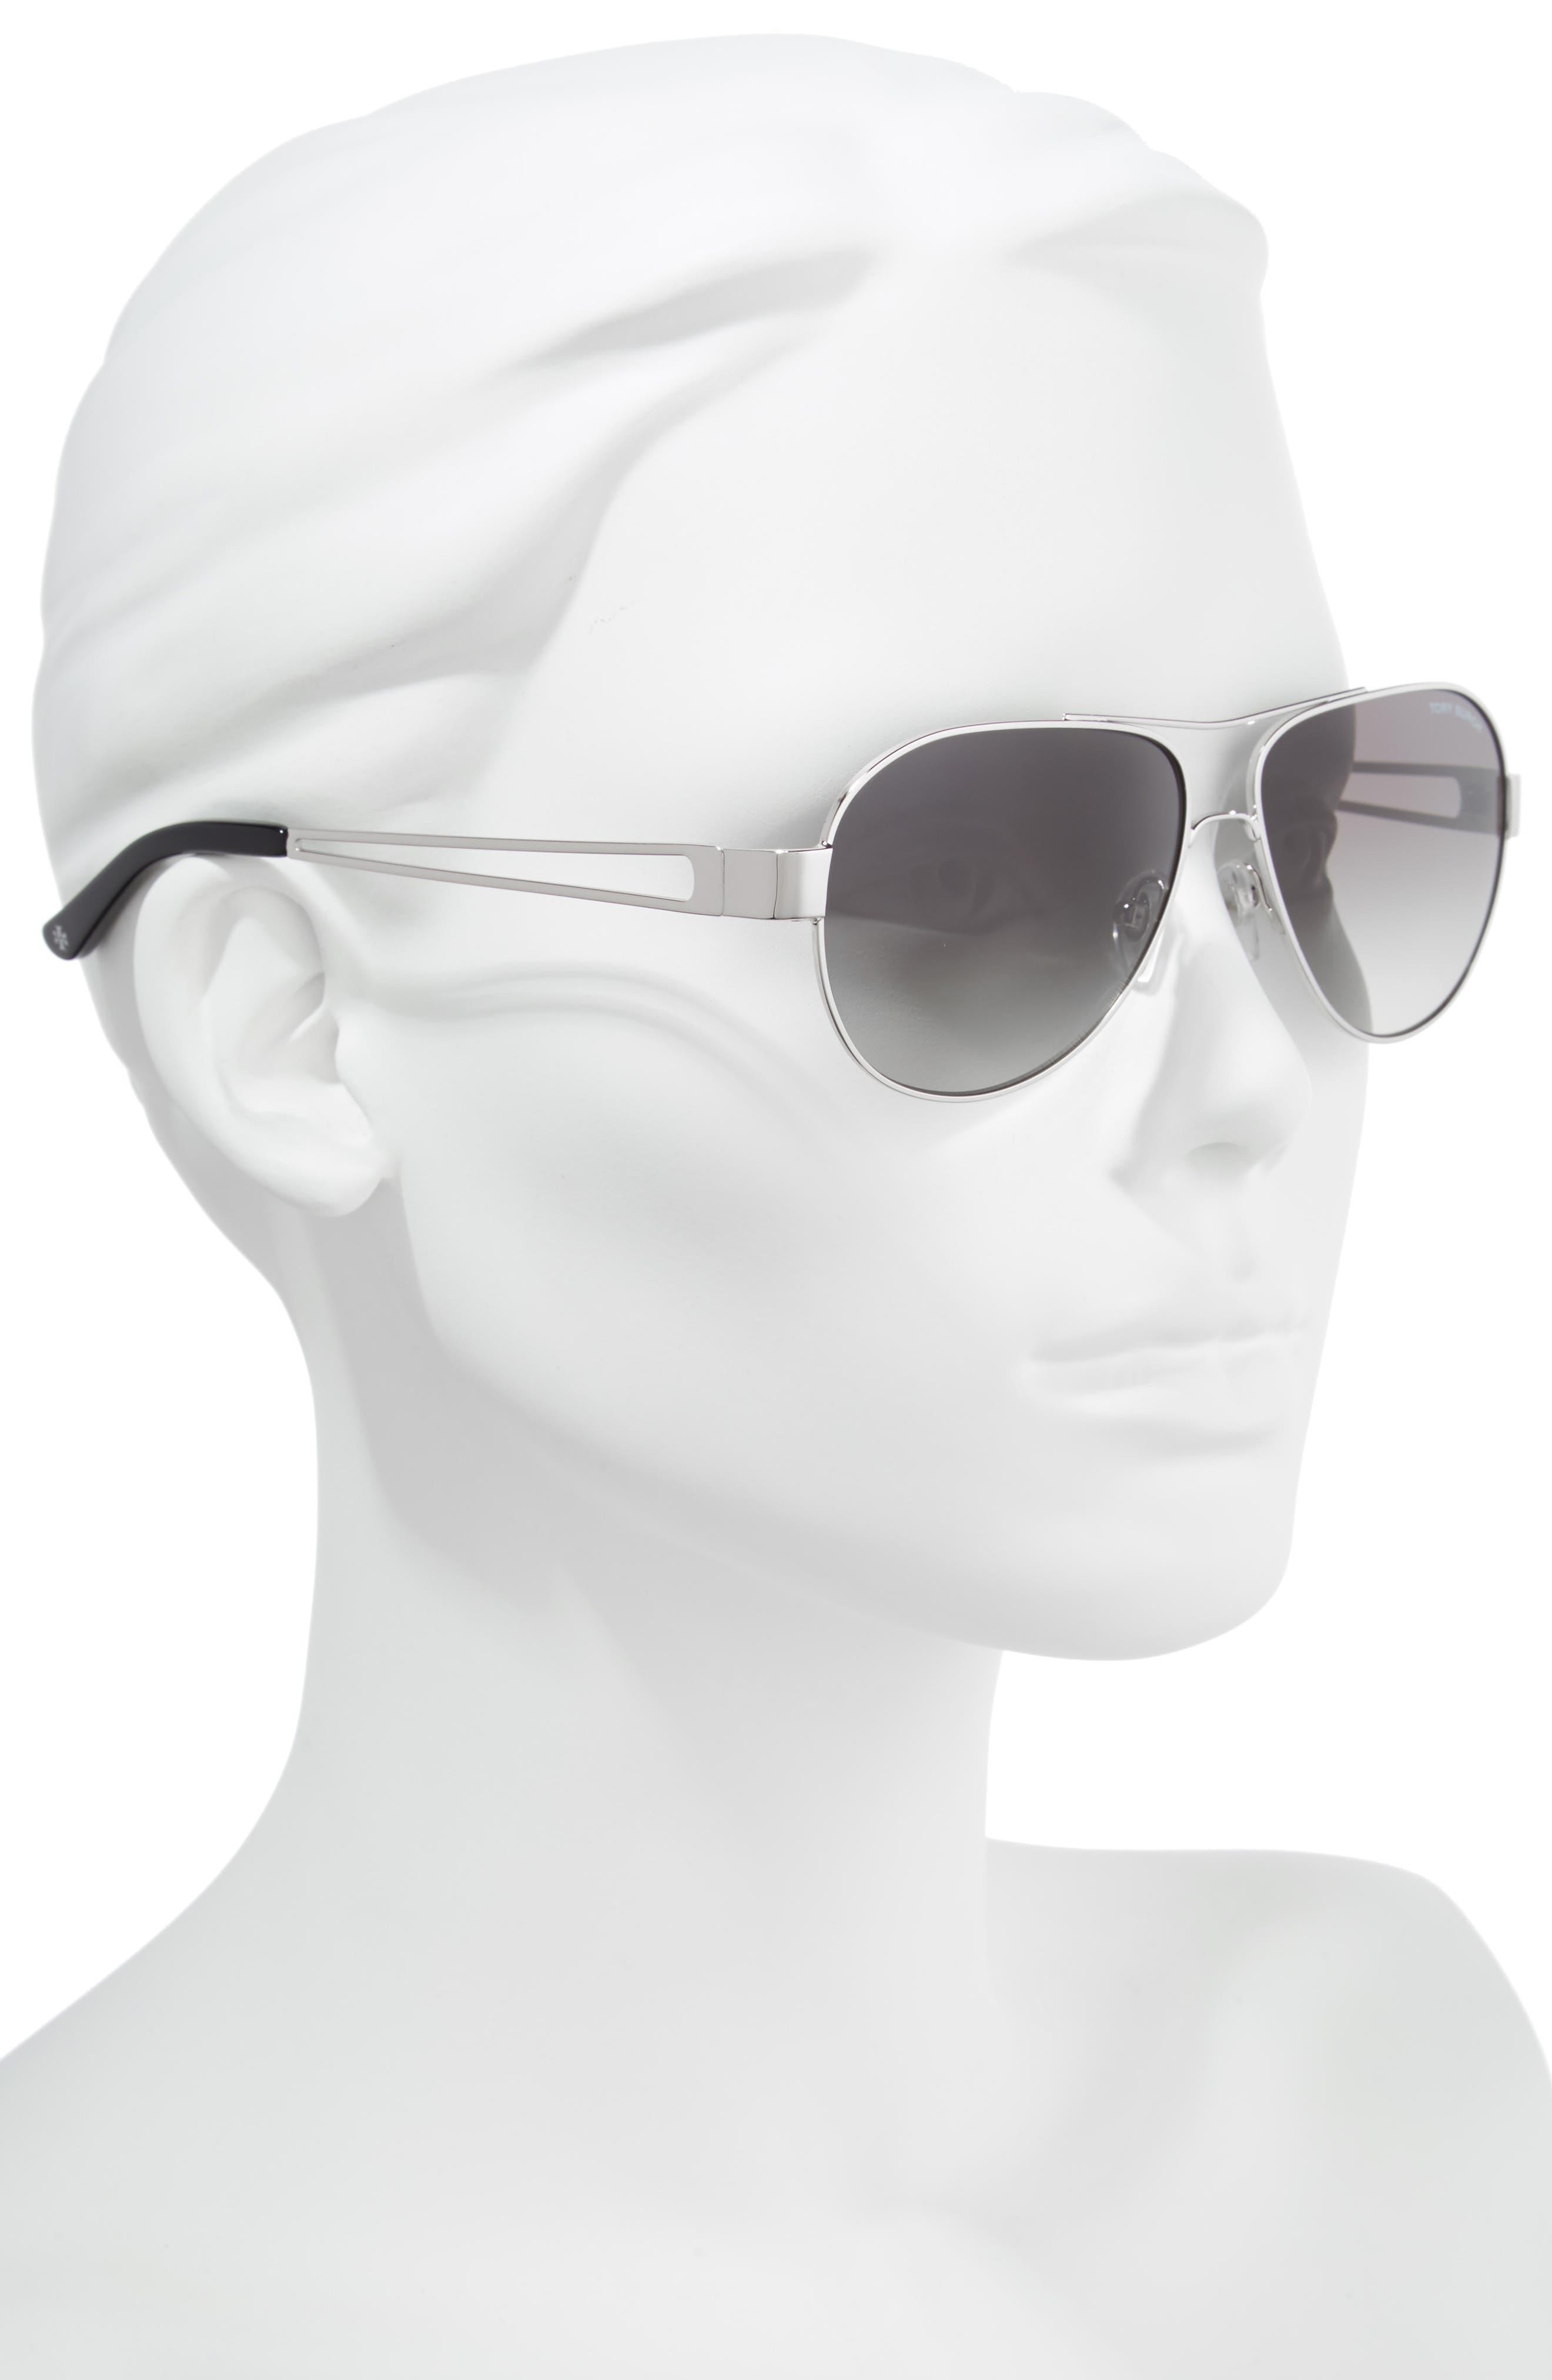 TORY BURCH,                             55mm Polarized Aviator Sunglasses,                             Alternate thumbnail 2, color,                             SILVER/ BLACK GRADIENT